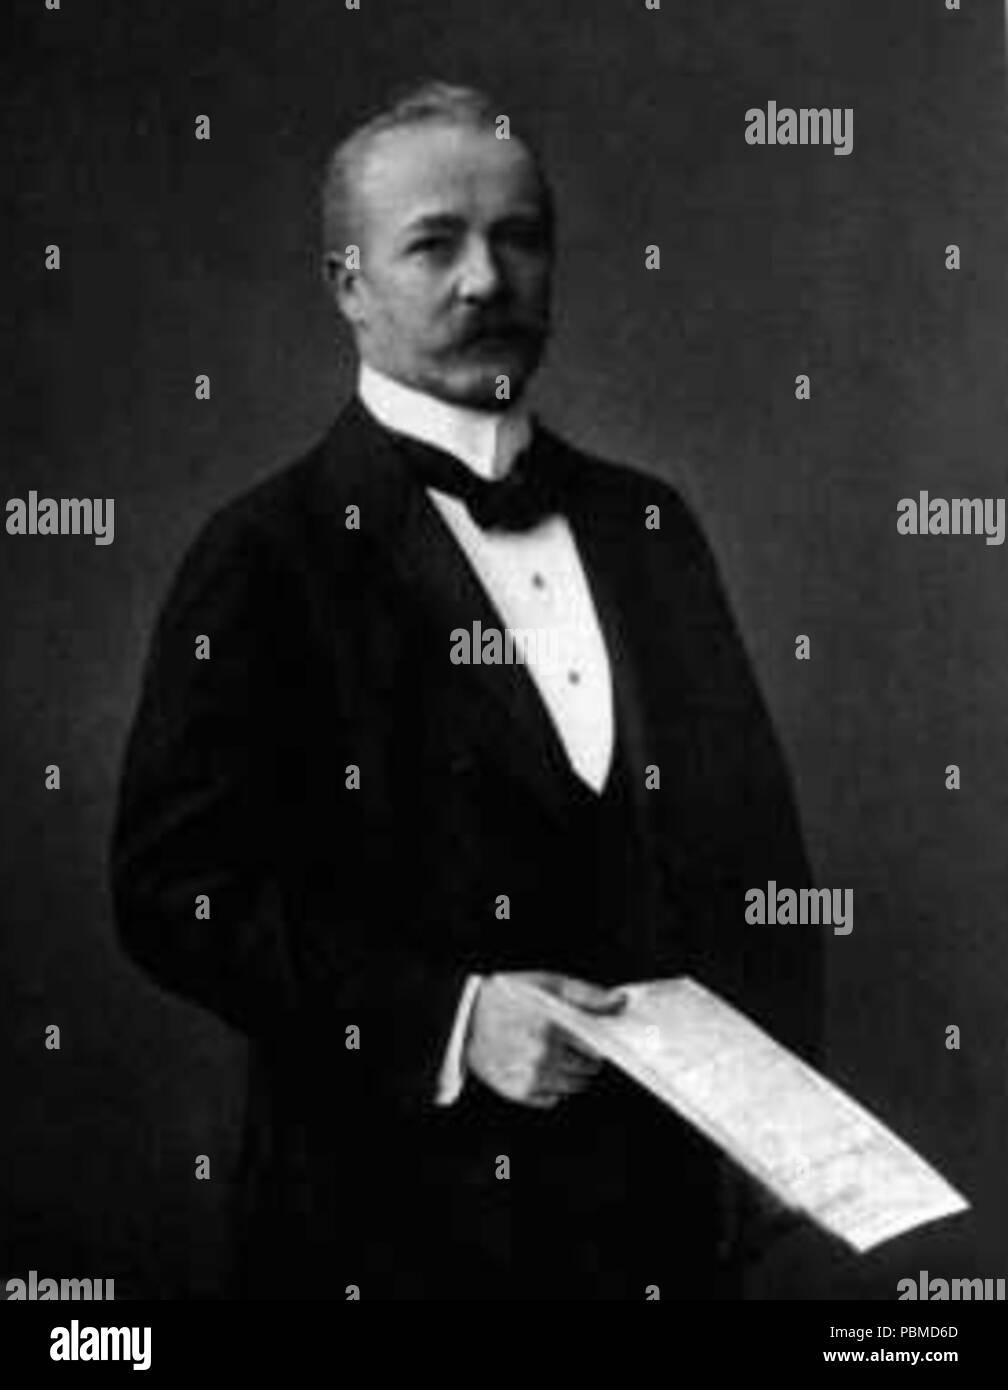 854 Karl Supf - german entrepreneur and colonialist - Stock Image